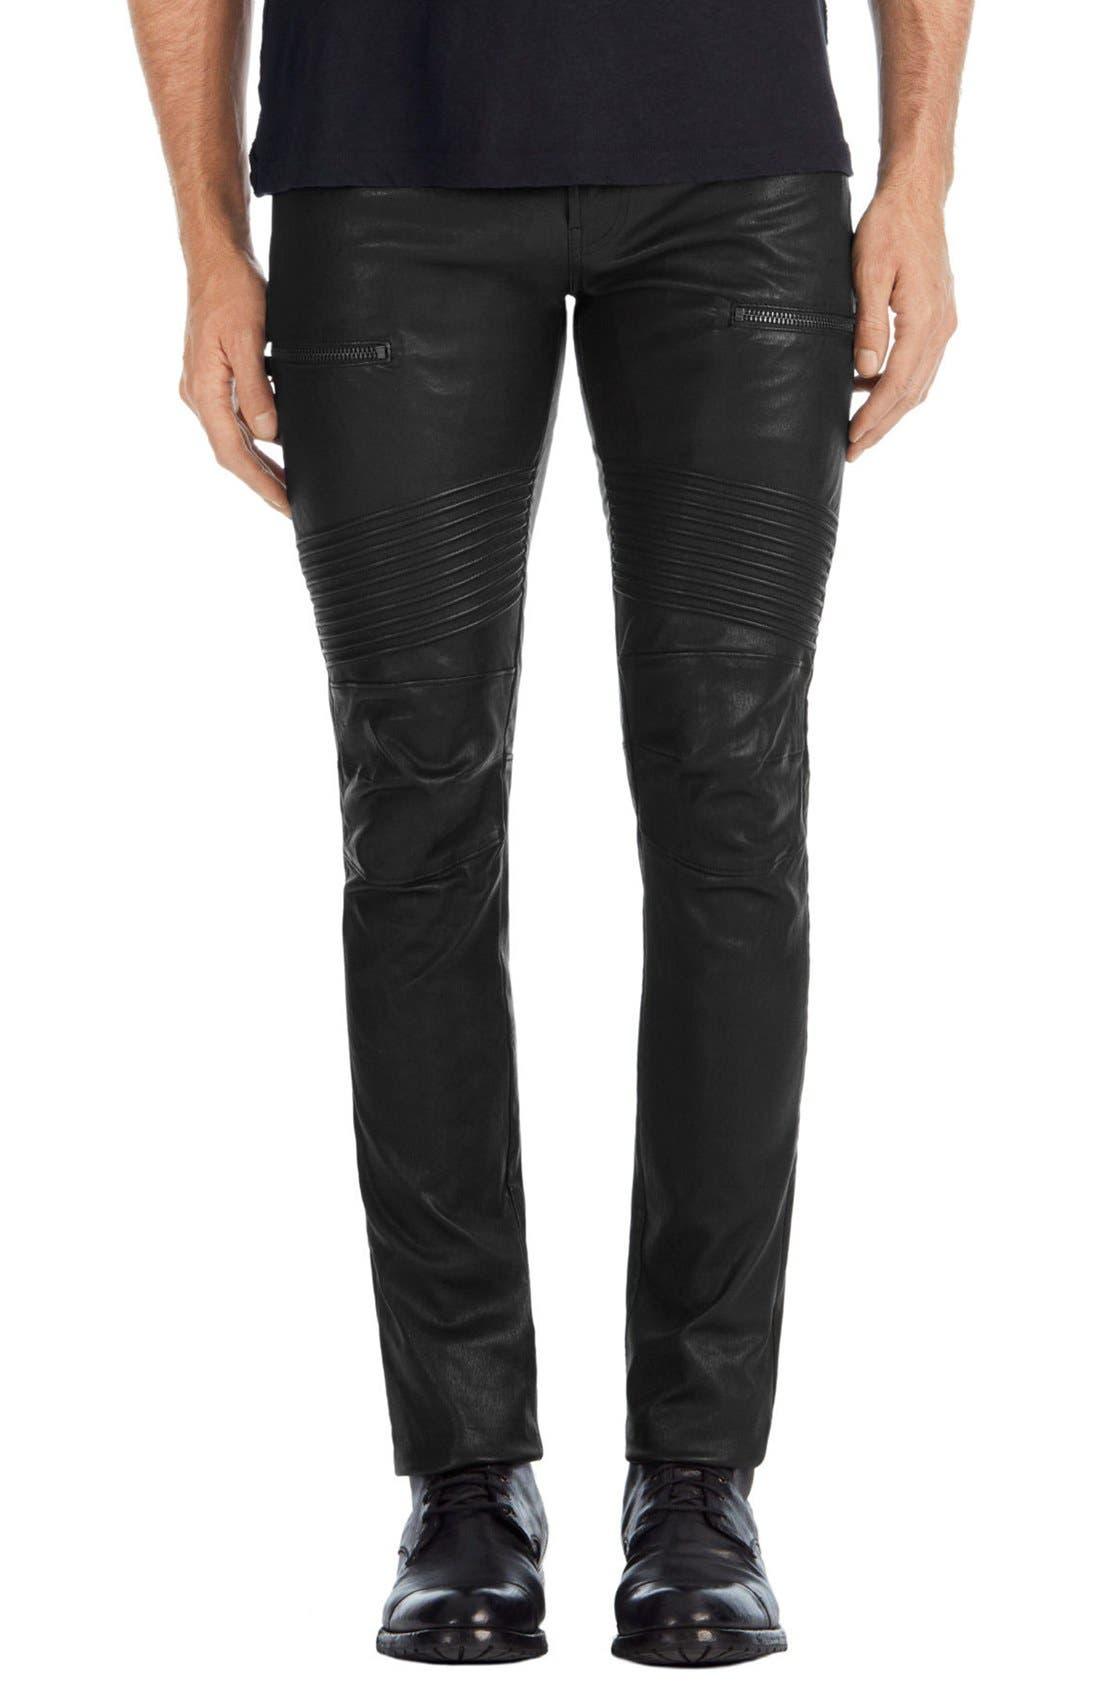 Acrux Skinny Fit Moto Leather Pants,                         Main,                         color,